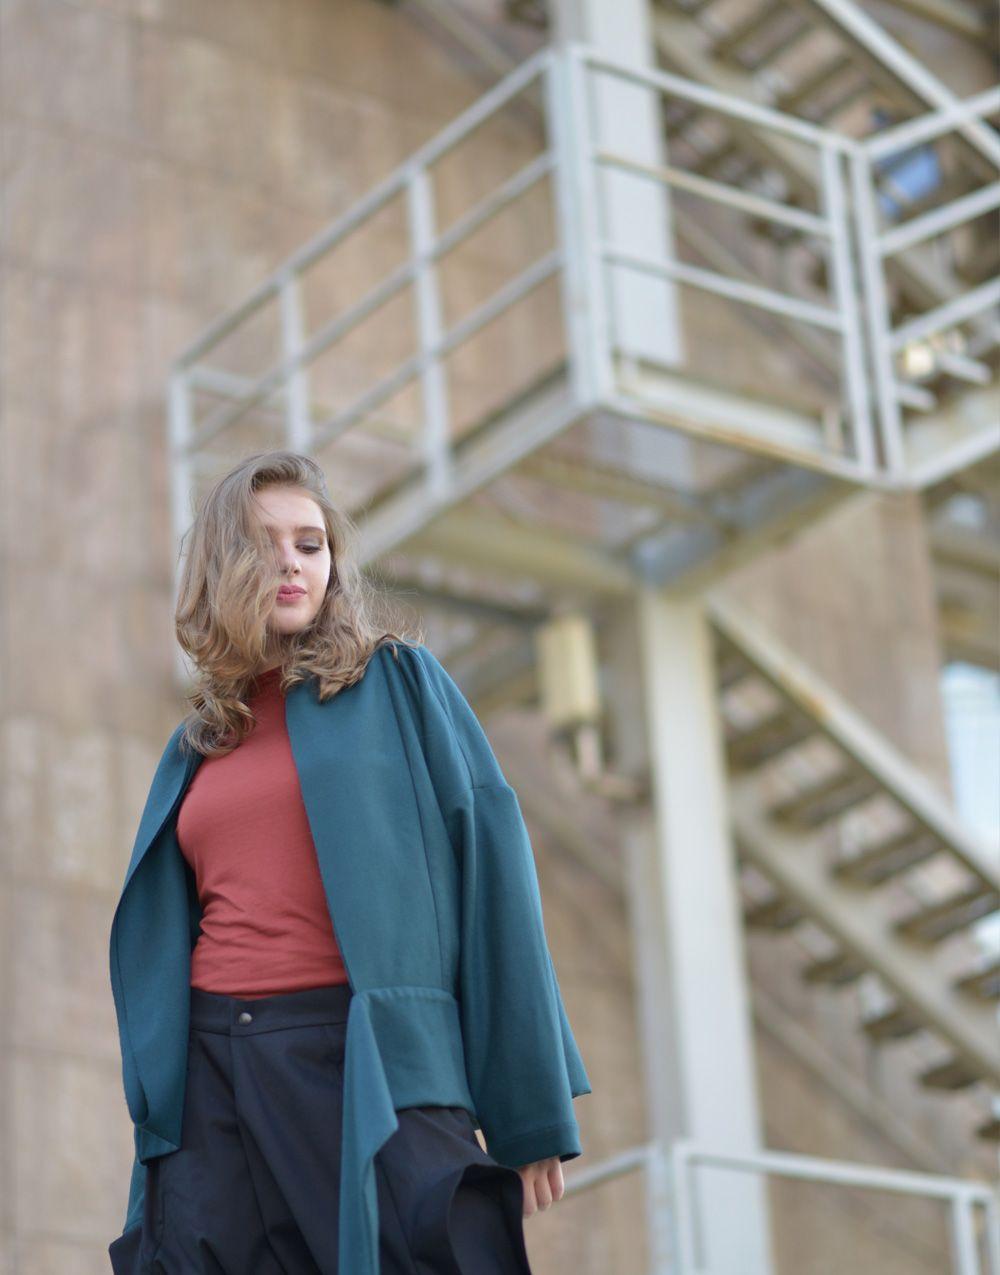 Wool Cardigan, Women Coat, Maxi Cardigan, Fall Winter Clothing ...